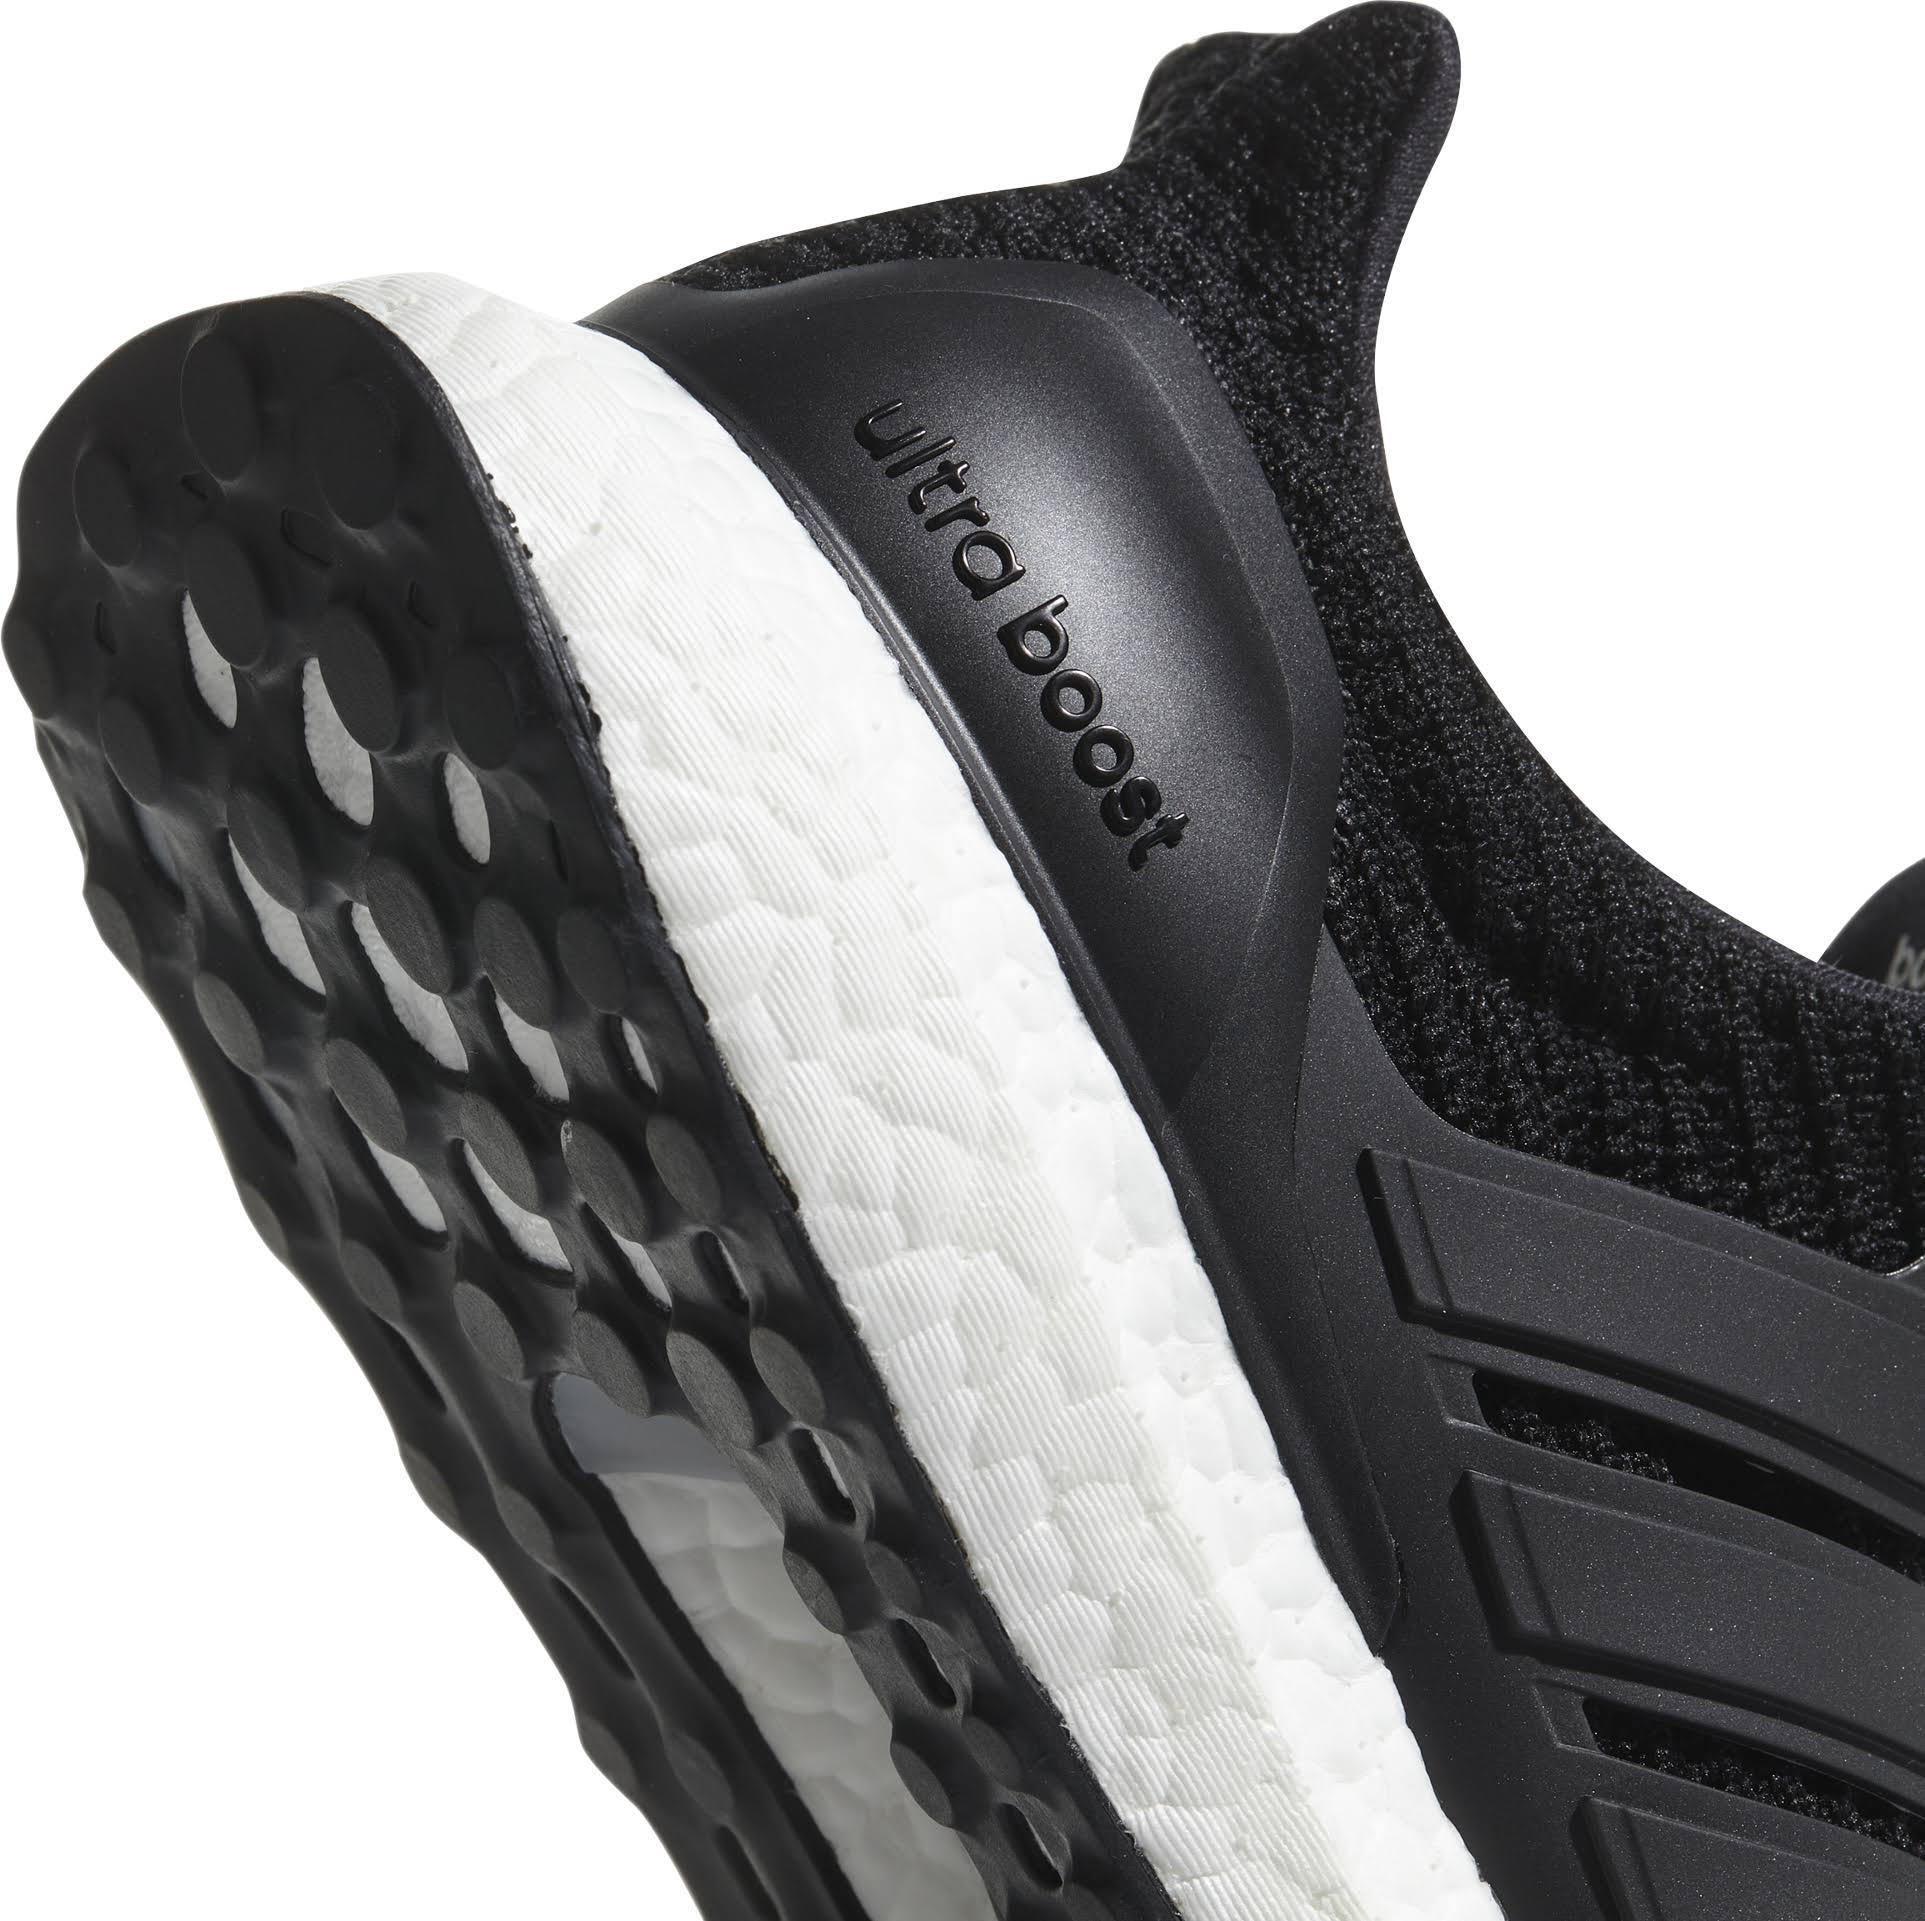 0 Zapatillas Negro Running De Mujer 4 Para Boost Ultra Adidas wwvzqrY